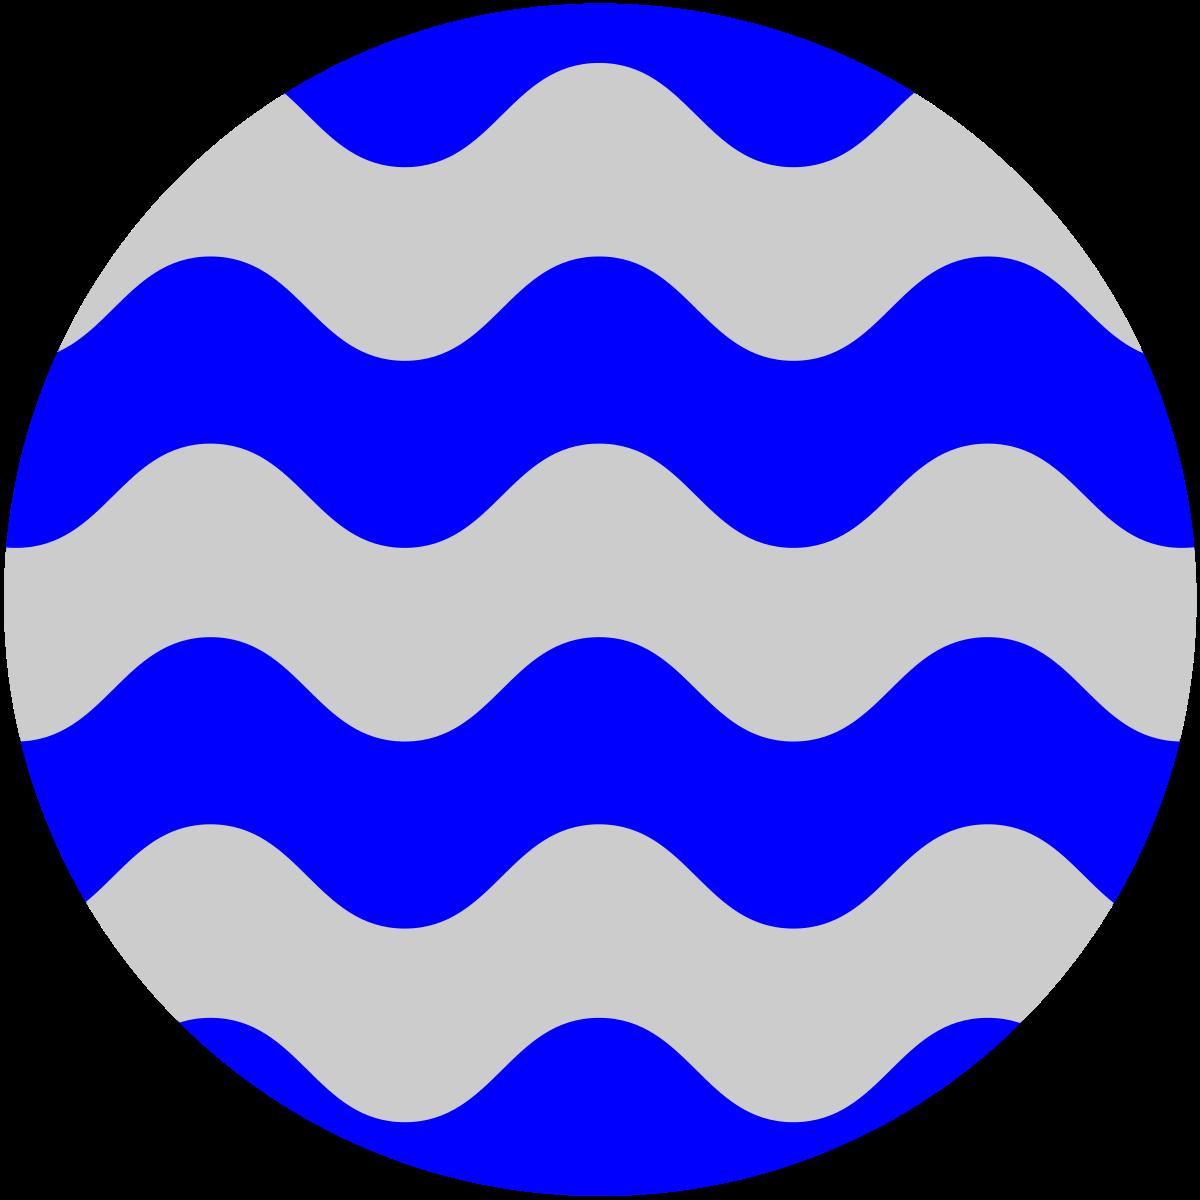 Fountain clipart blue water. Heraldry wikipedia